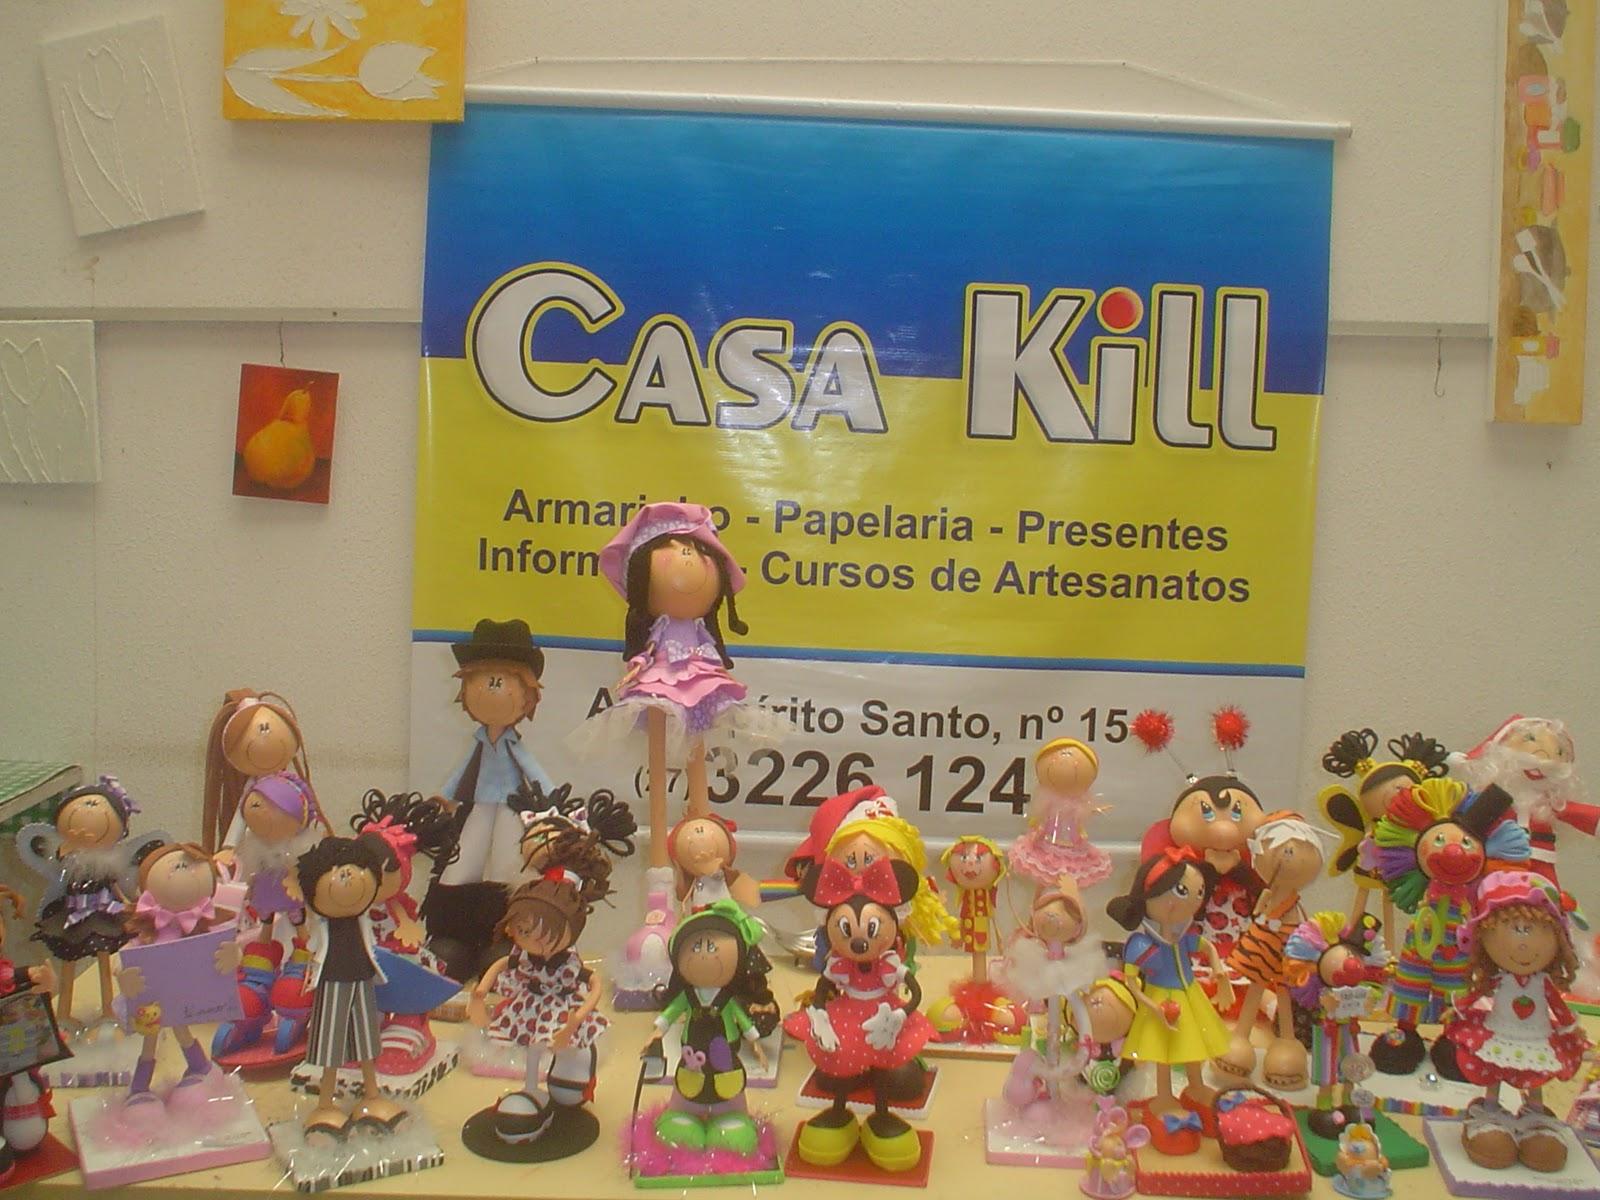 CASA KILL - (27)3226-1245